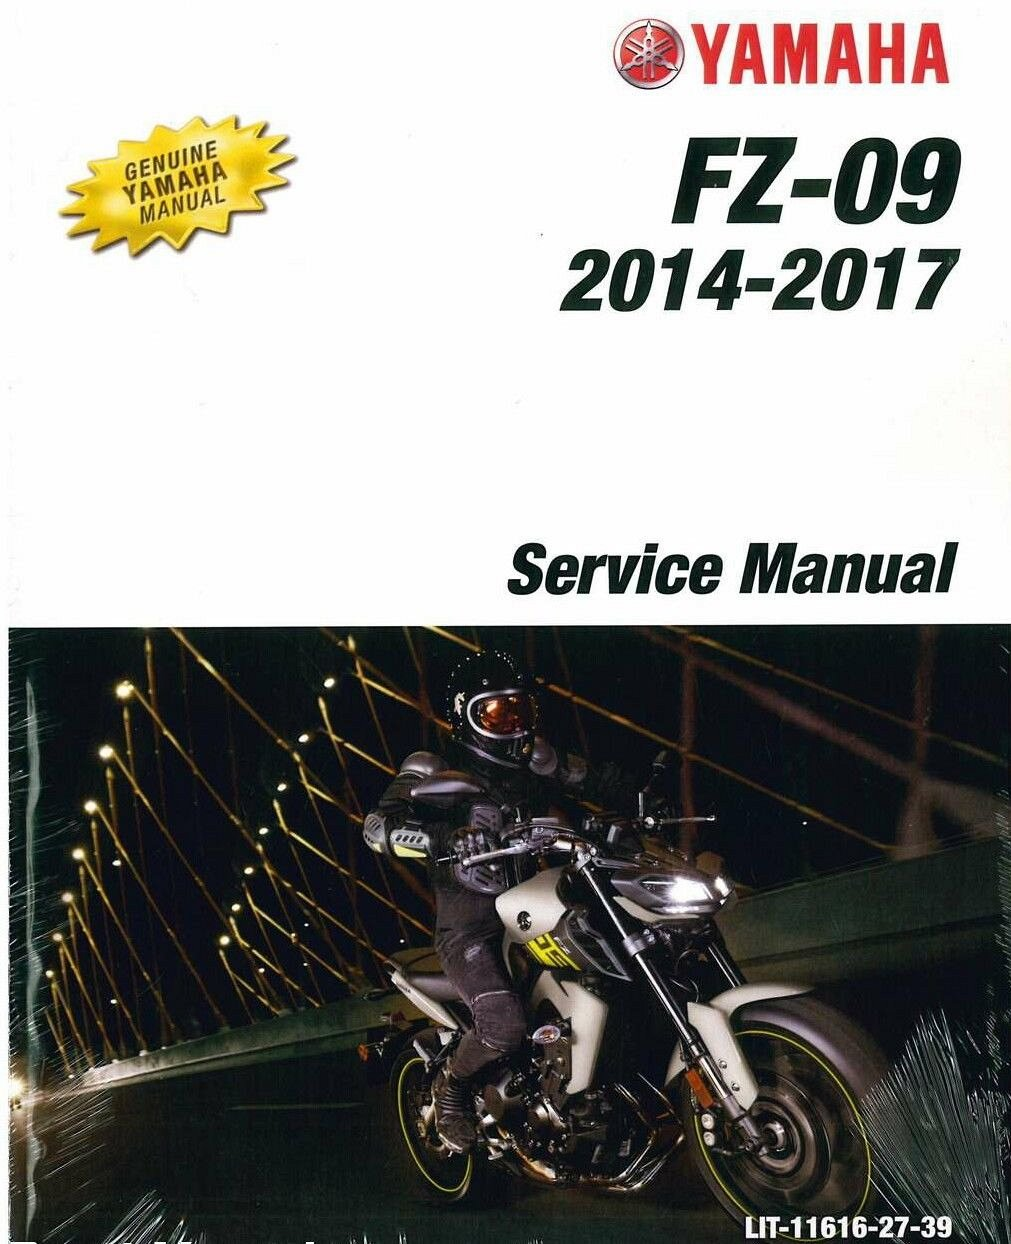 2014 2015 2016 2017 yamaha fz 09 fz09 service parts owner rh unisquare com yamaha fz 750 repair manual download yamaha fz 750 manual free downloads